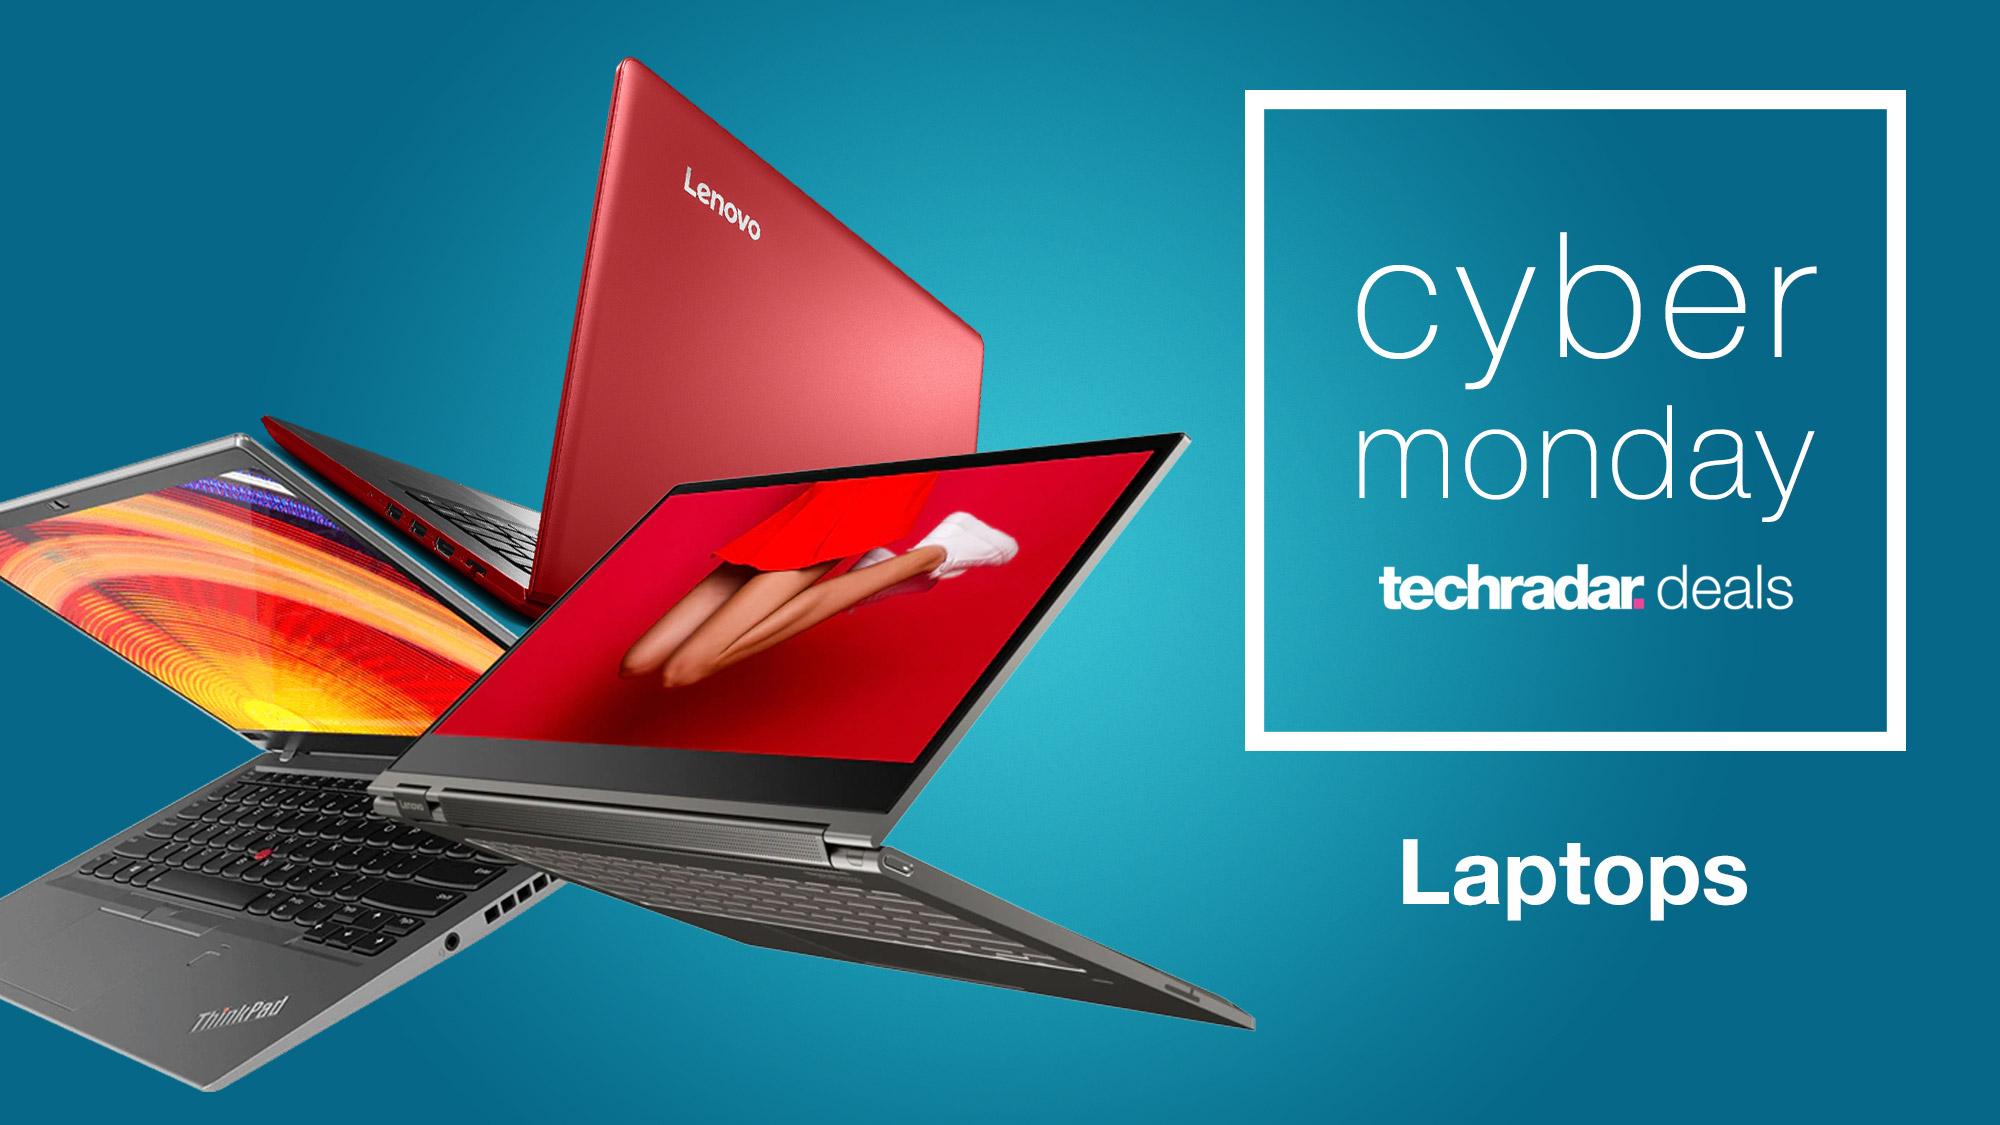 Best Black Friday Laptop Deals 2020.The Best Cyber Monday Laptop Deals 2019 Techradar